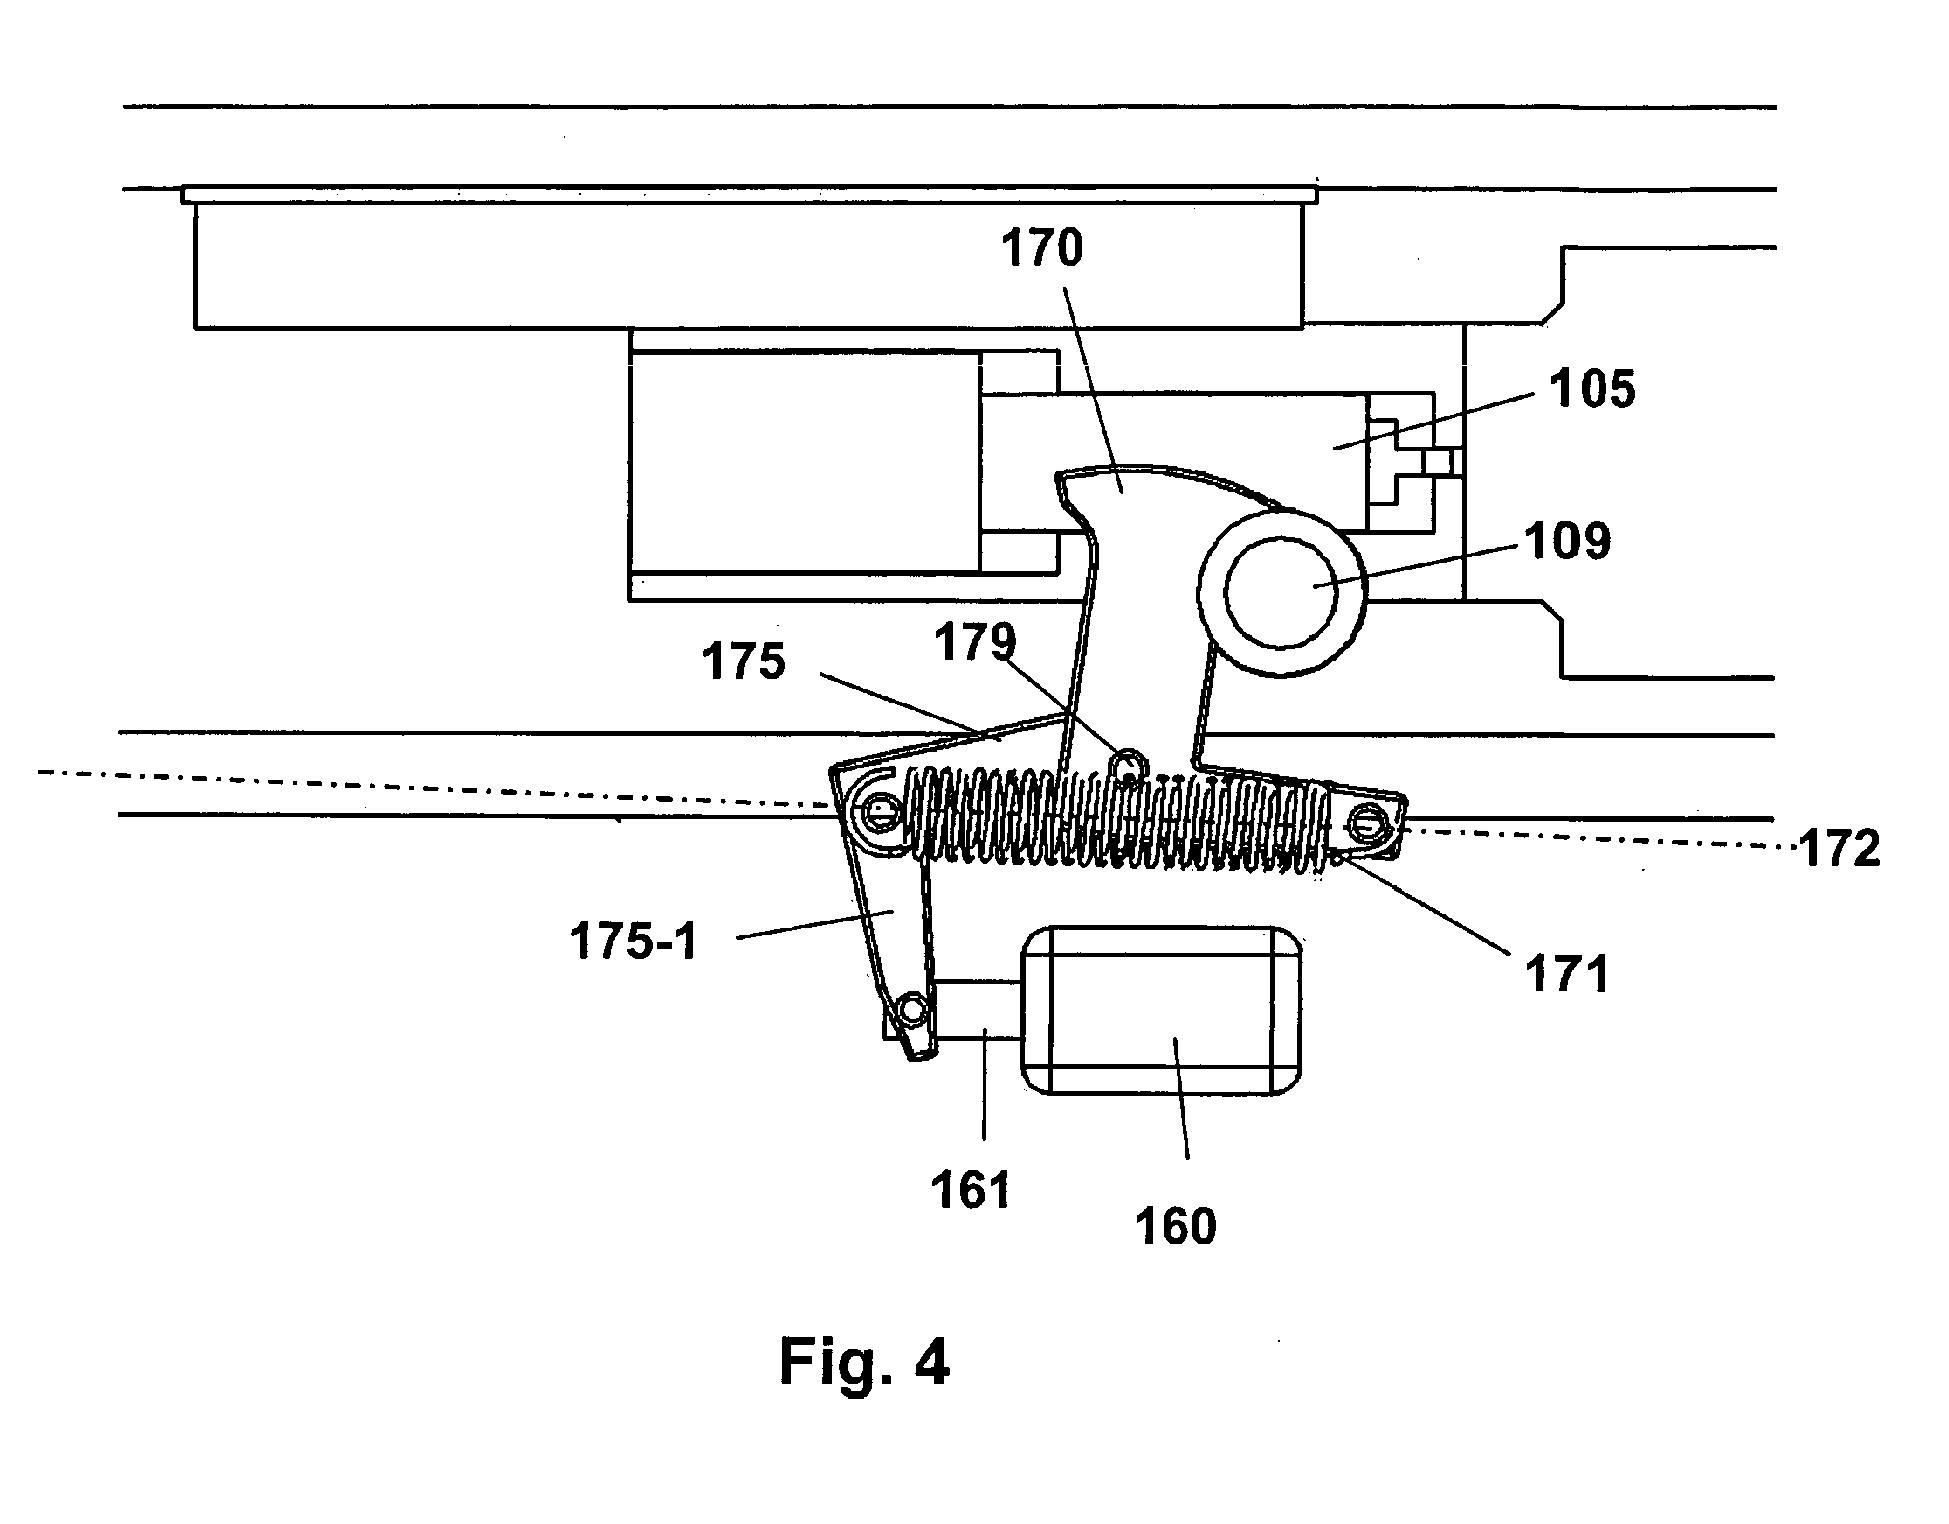 Nissan Cl50lp Forklift Wiring Diagram. . Wiring Diagram on